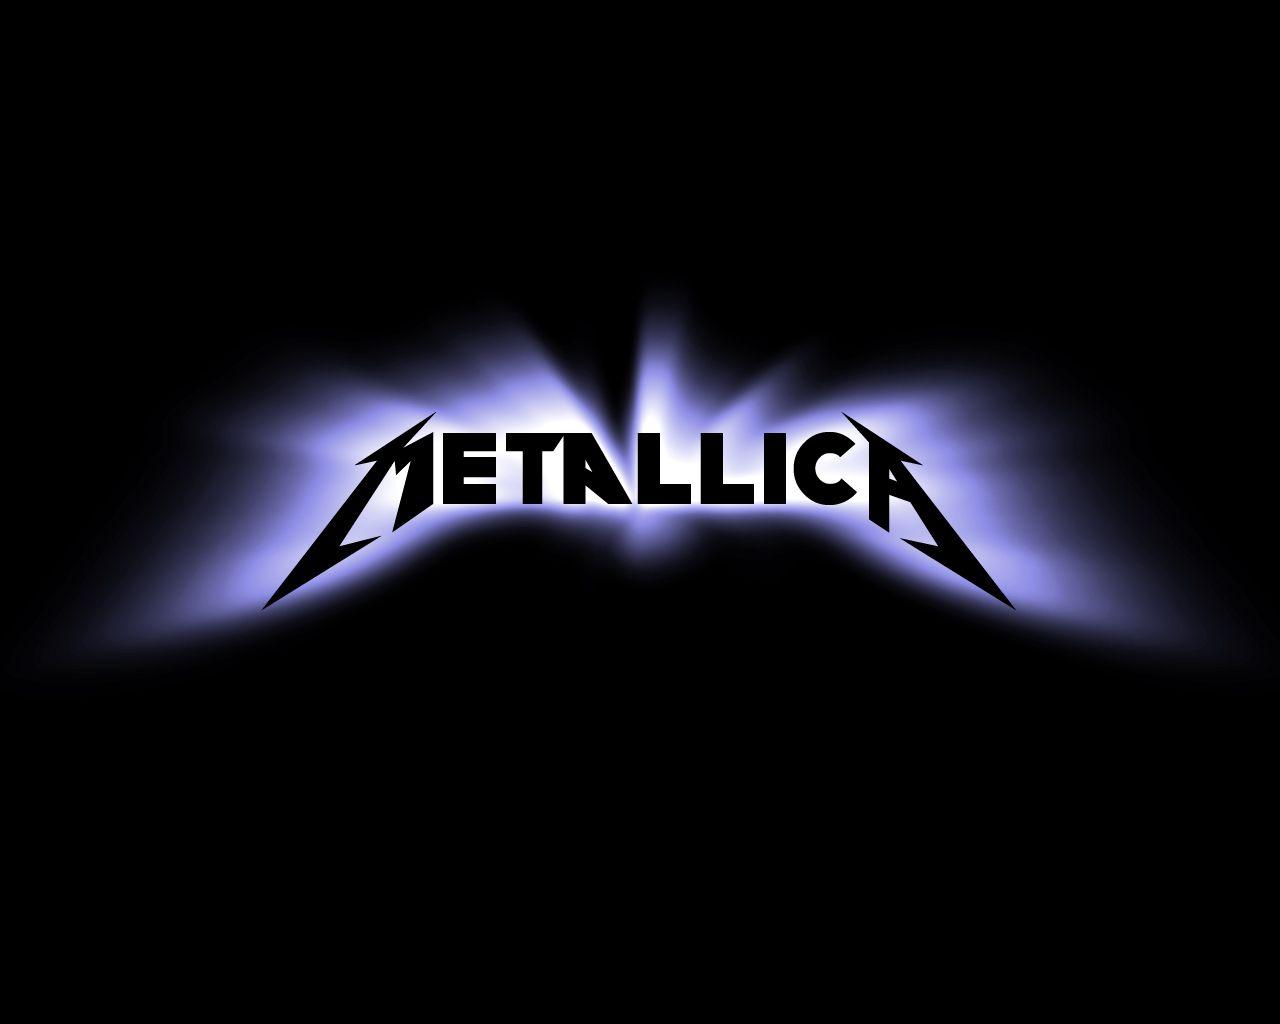 Metallica Centerblog